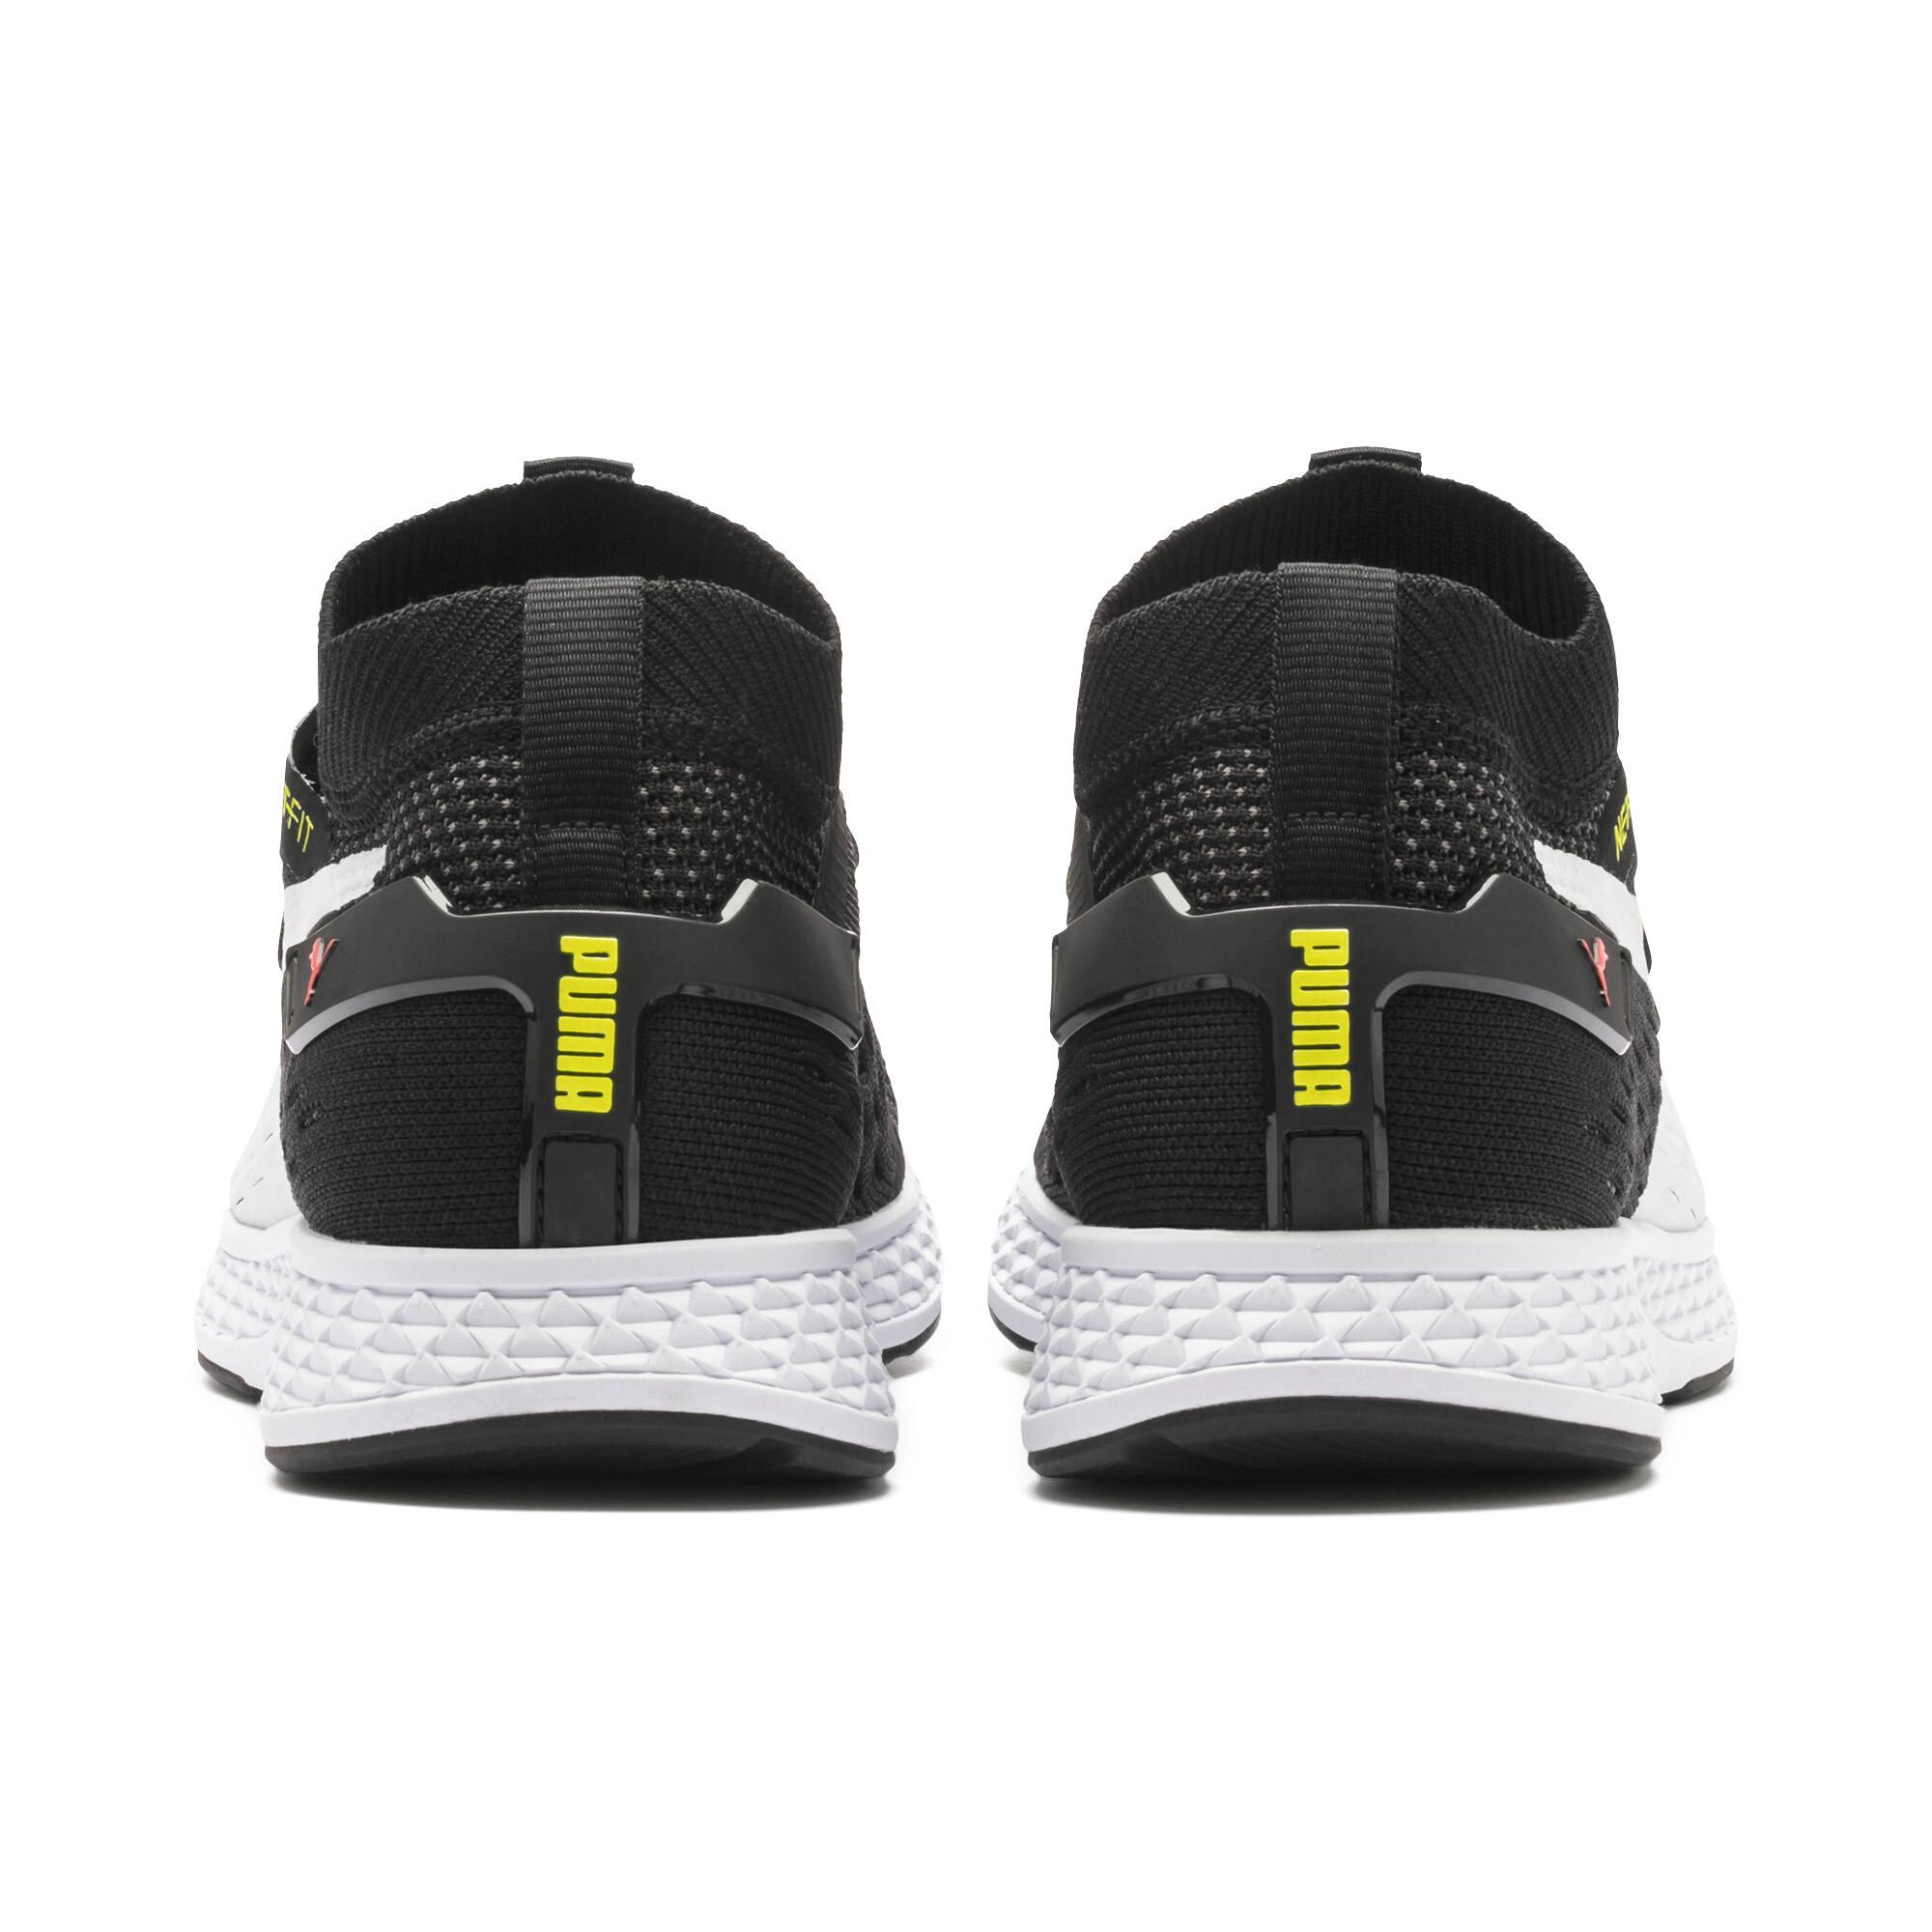 PUMA-SPEED-500-Men-039-s-Running-Shoes-Men-Shoe-Running thumbnail 3